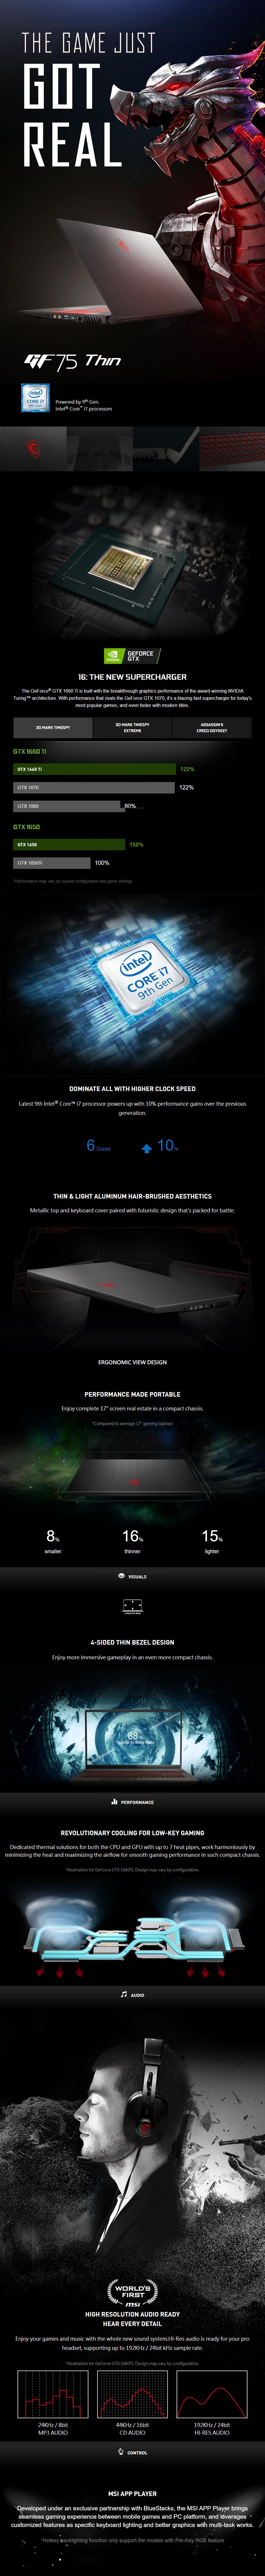 "MSI GF75 Thin 9SC 17.3"" 120Hz Gaming Laptop i7-9750H 16GB 256GB+1TB GTX1650 W10H - Overview 1"